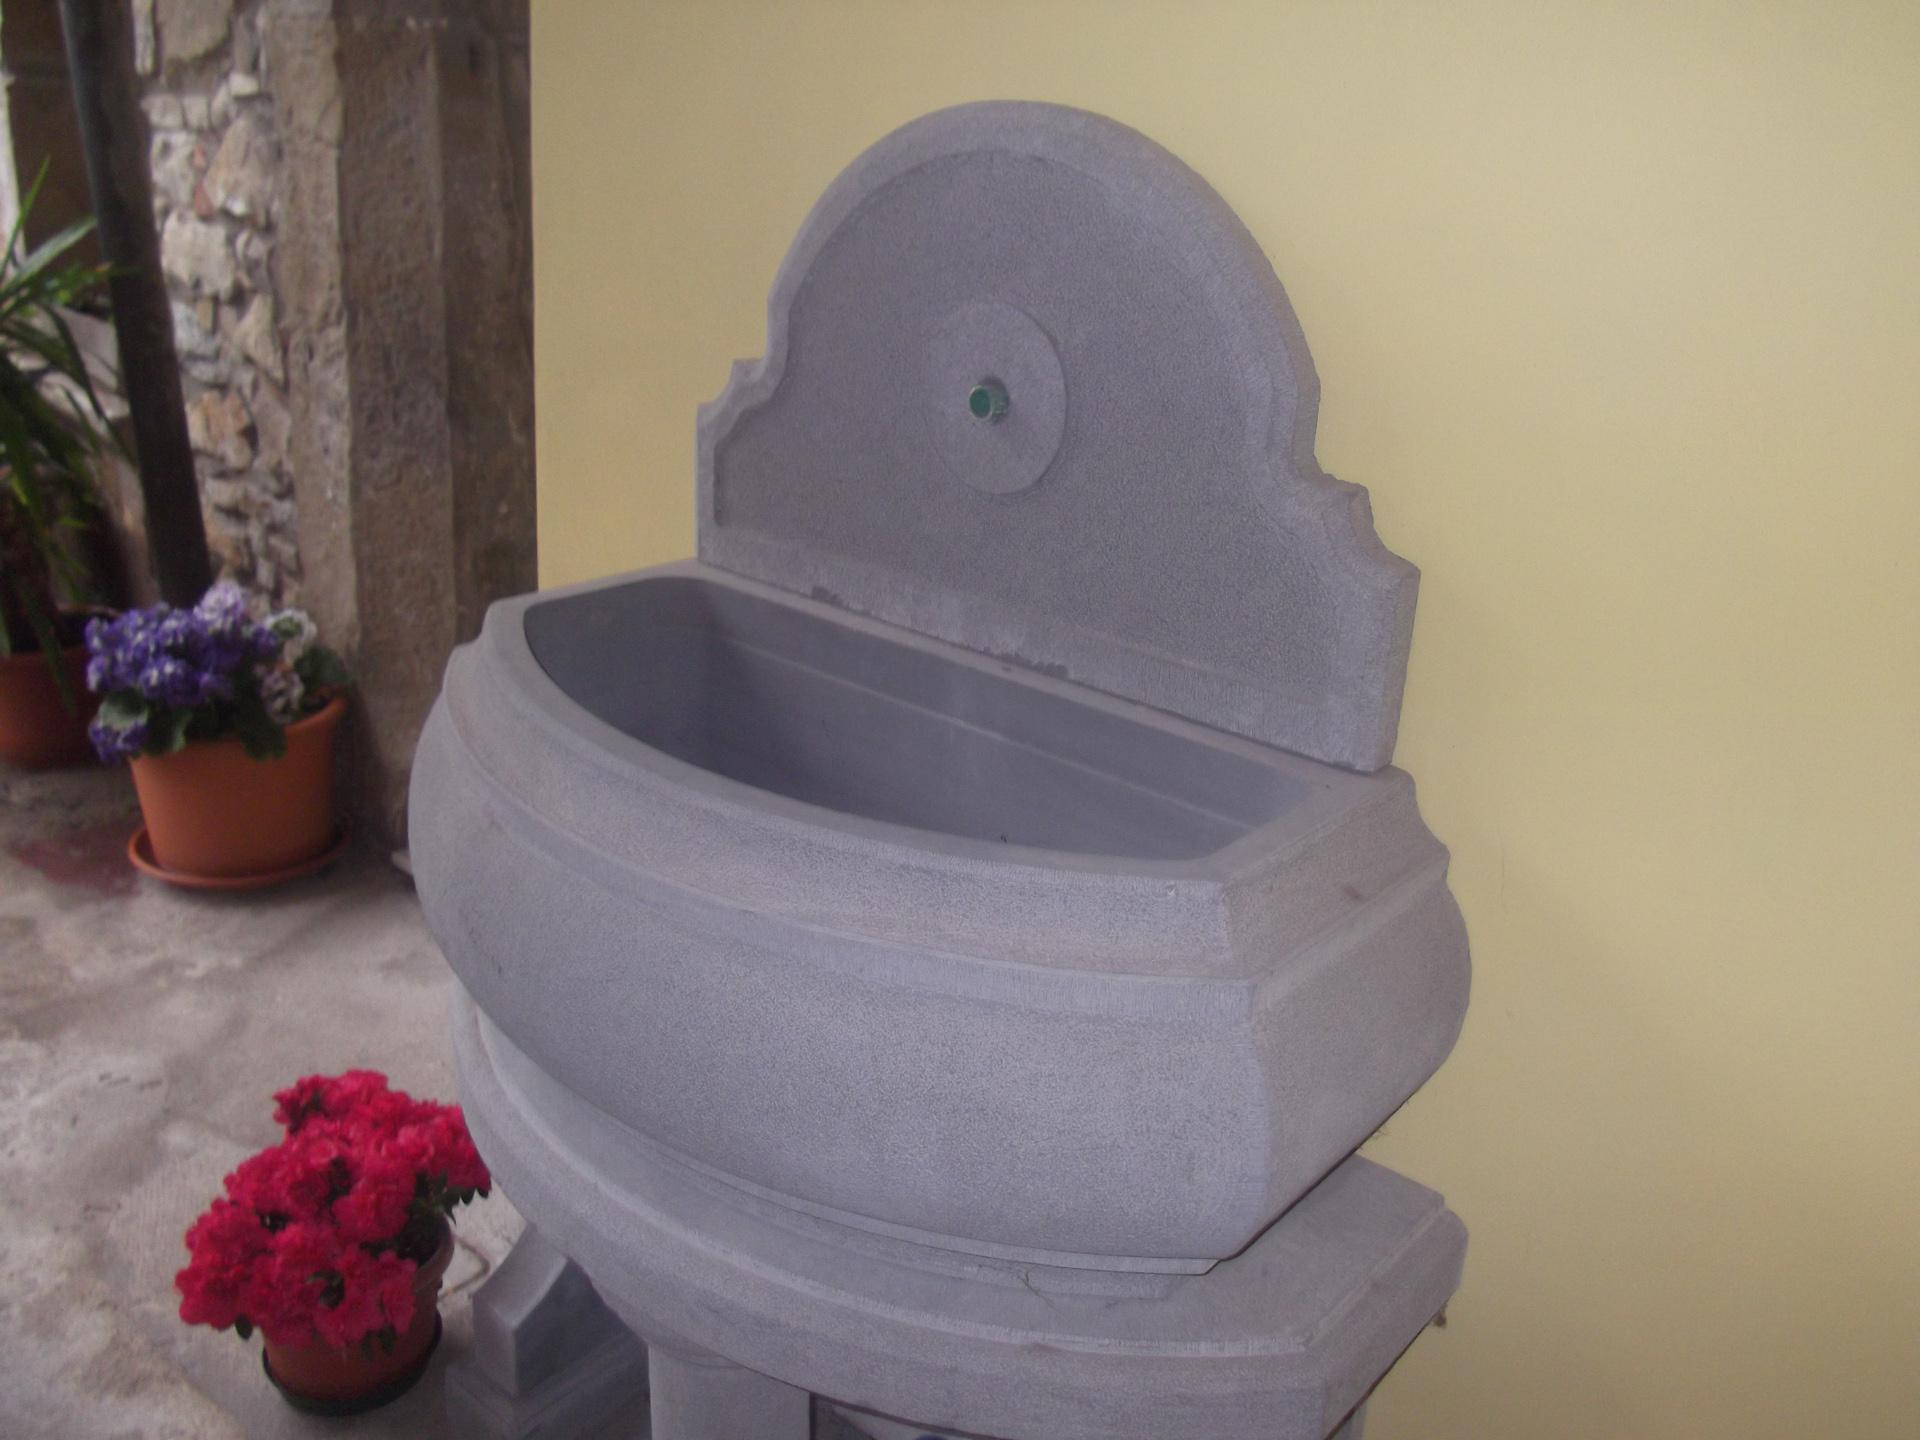 Vasche In Pietra Per Fontane fontane e vasche per esterni | perletti omar